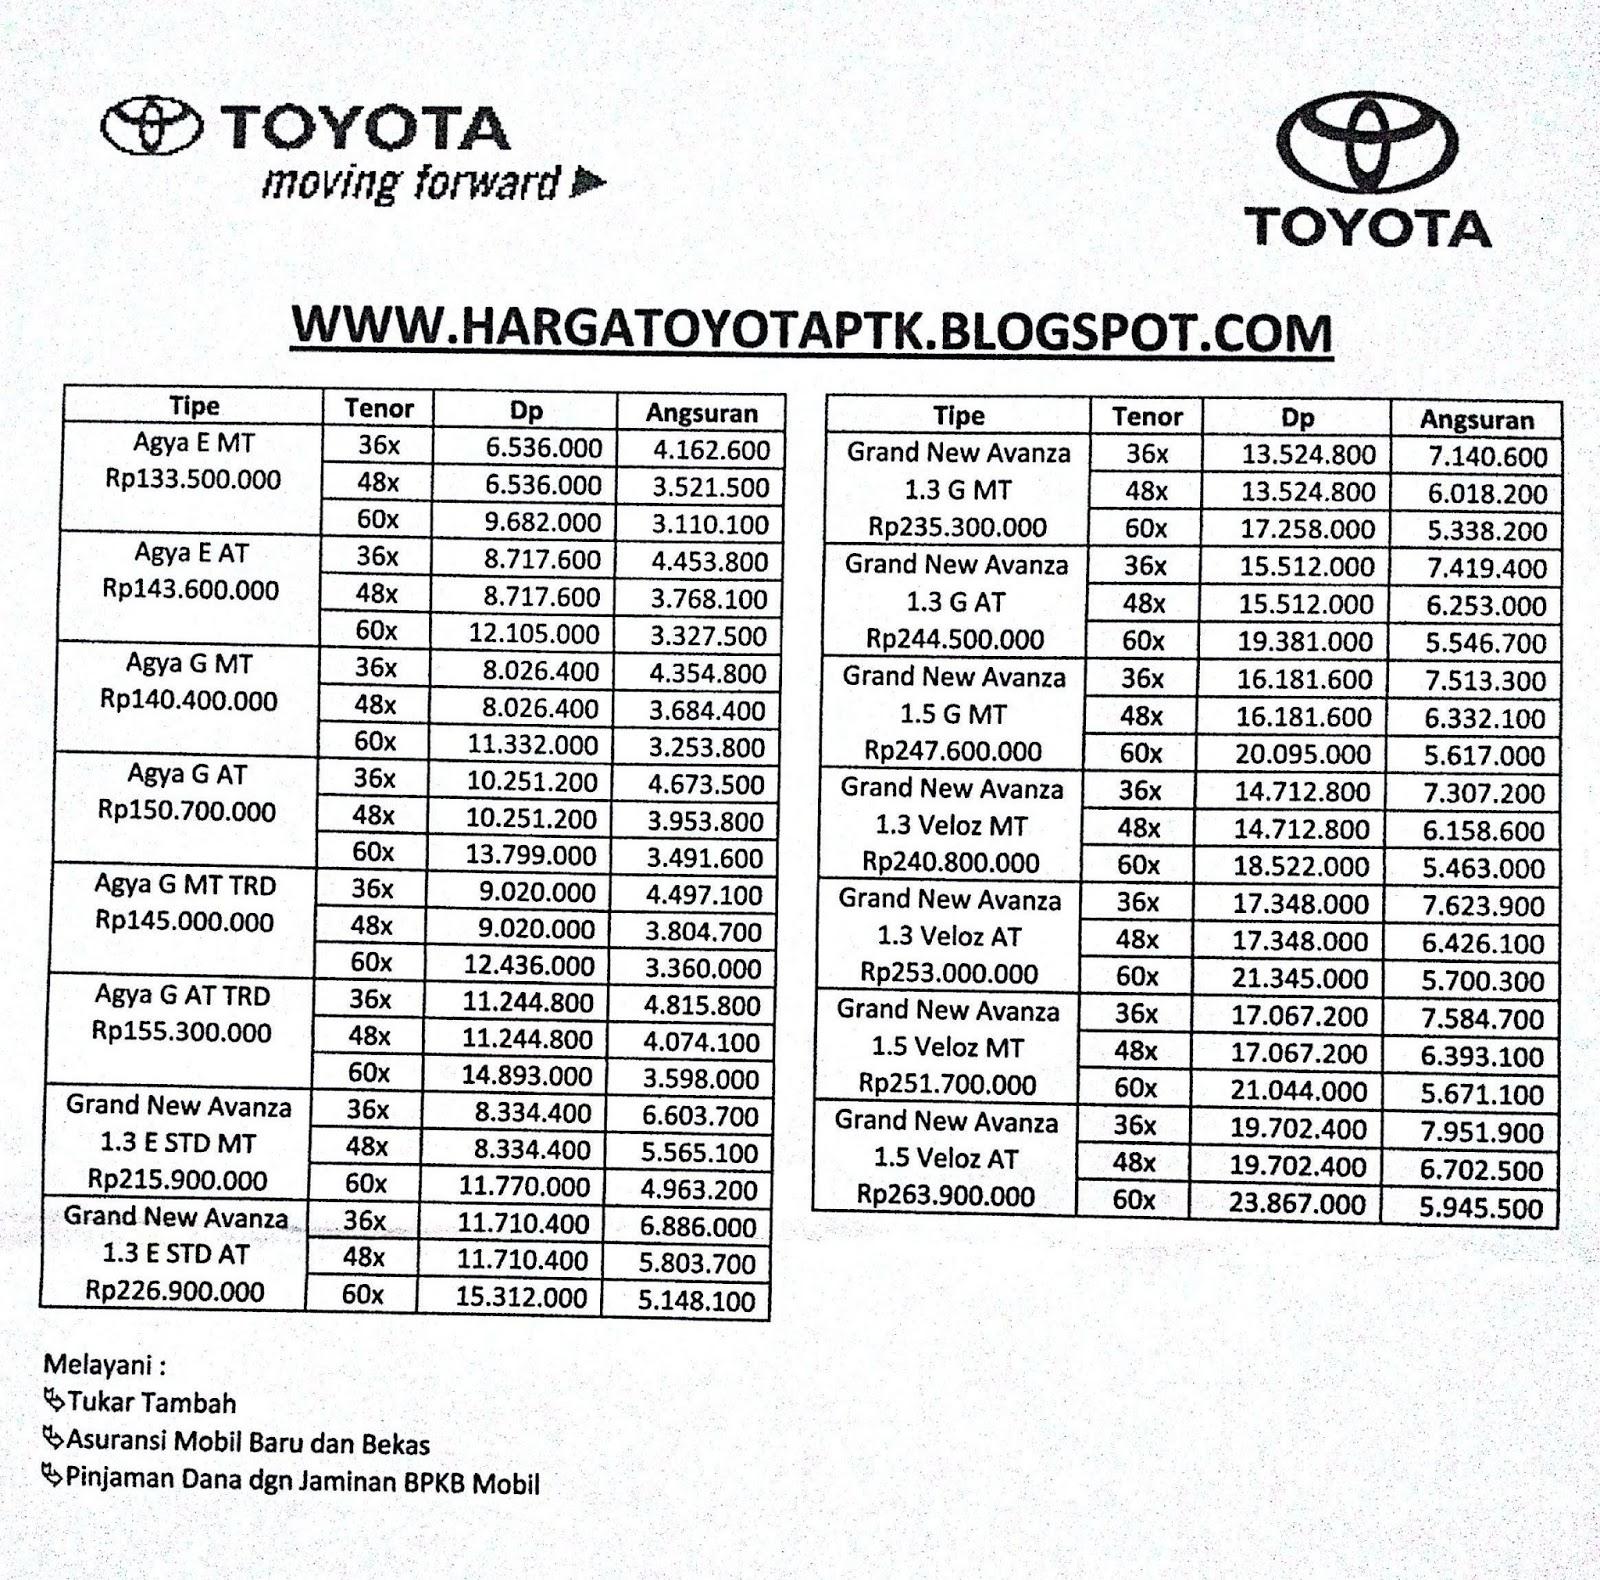 Grand New Avanza E Mt Velg Veloz 1.3 Daftar Harga Dan Paket Kredit Toyota Pontianak Ter Updated